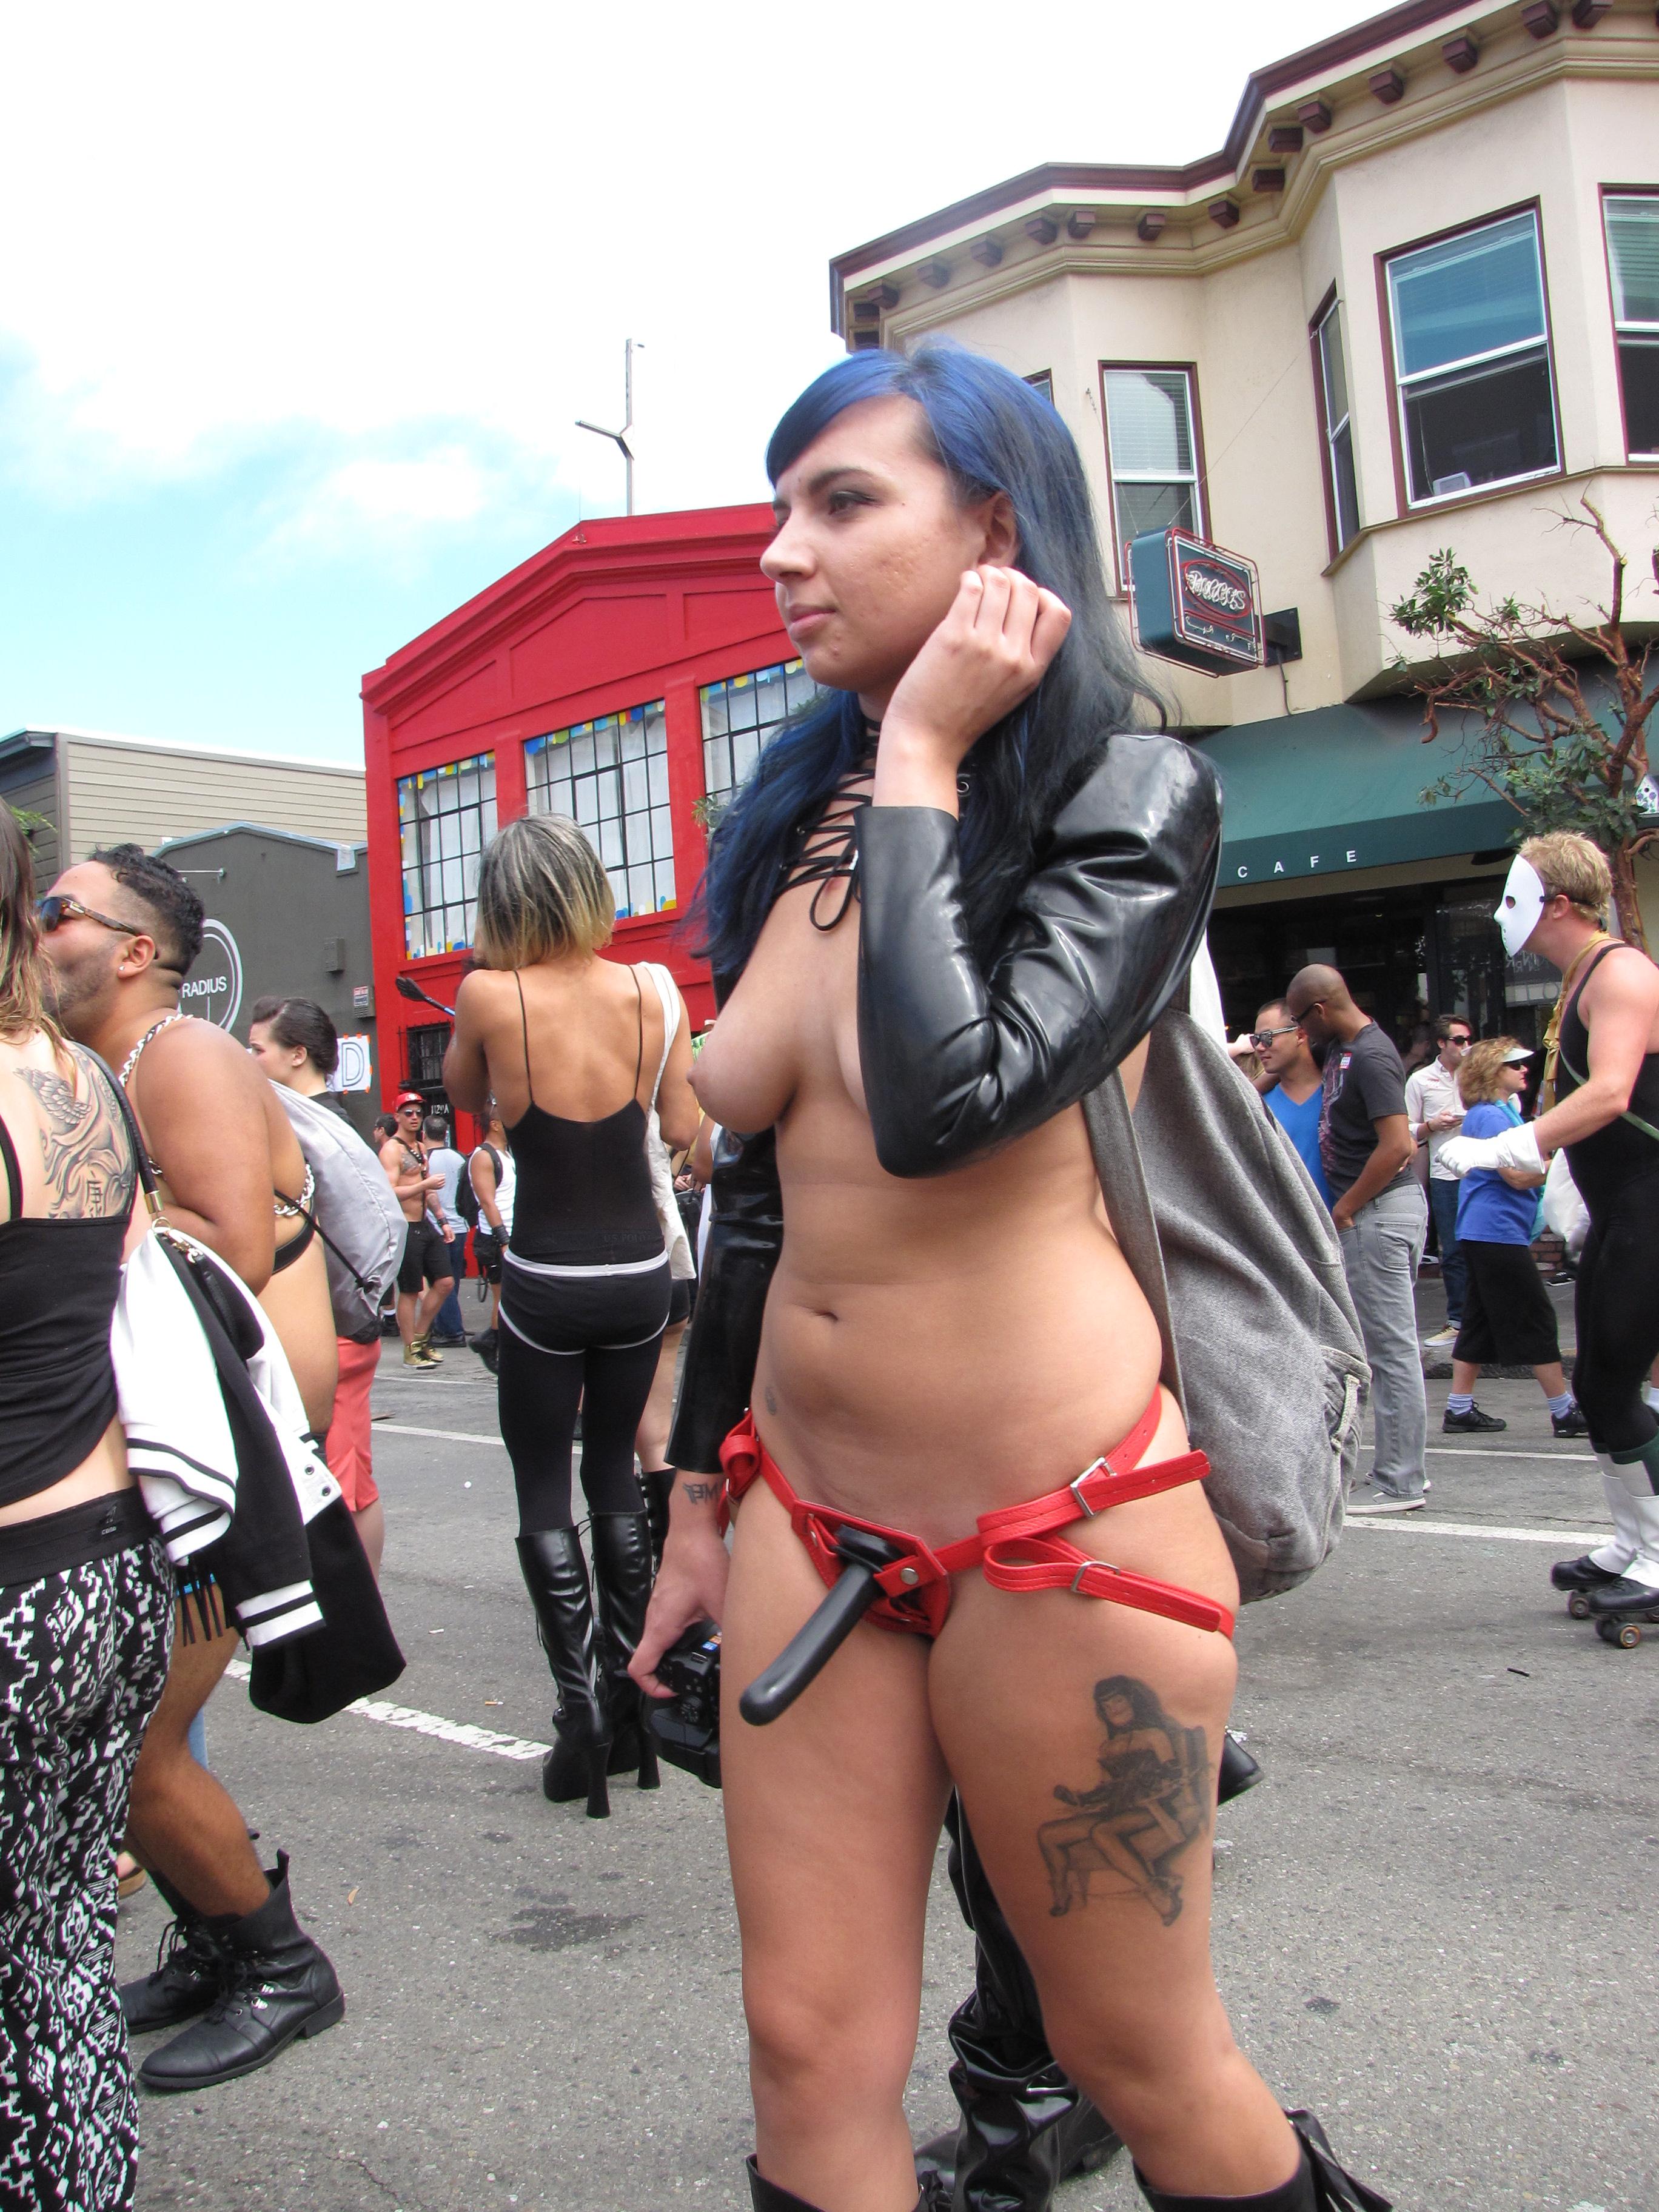 Folsom street fair sf 2004 2010